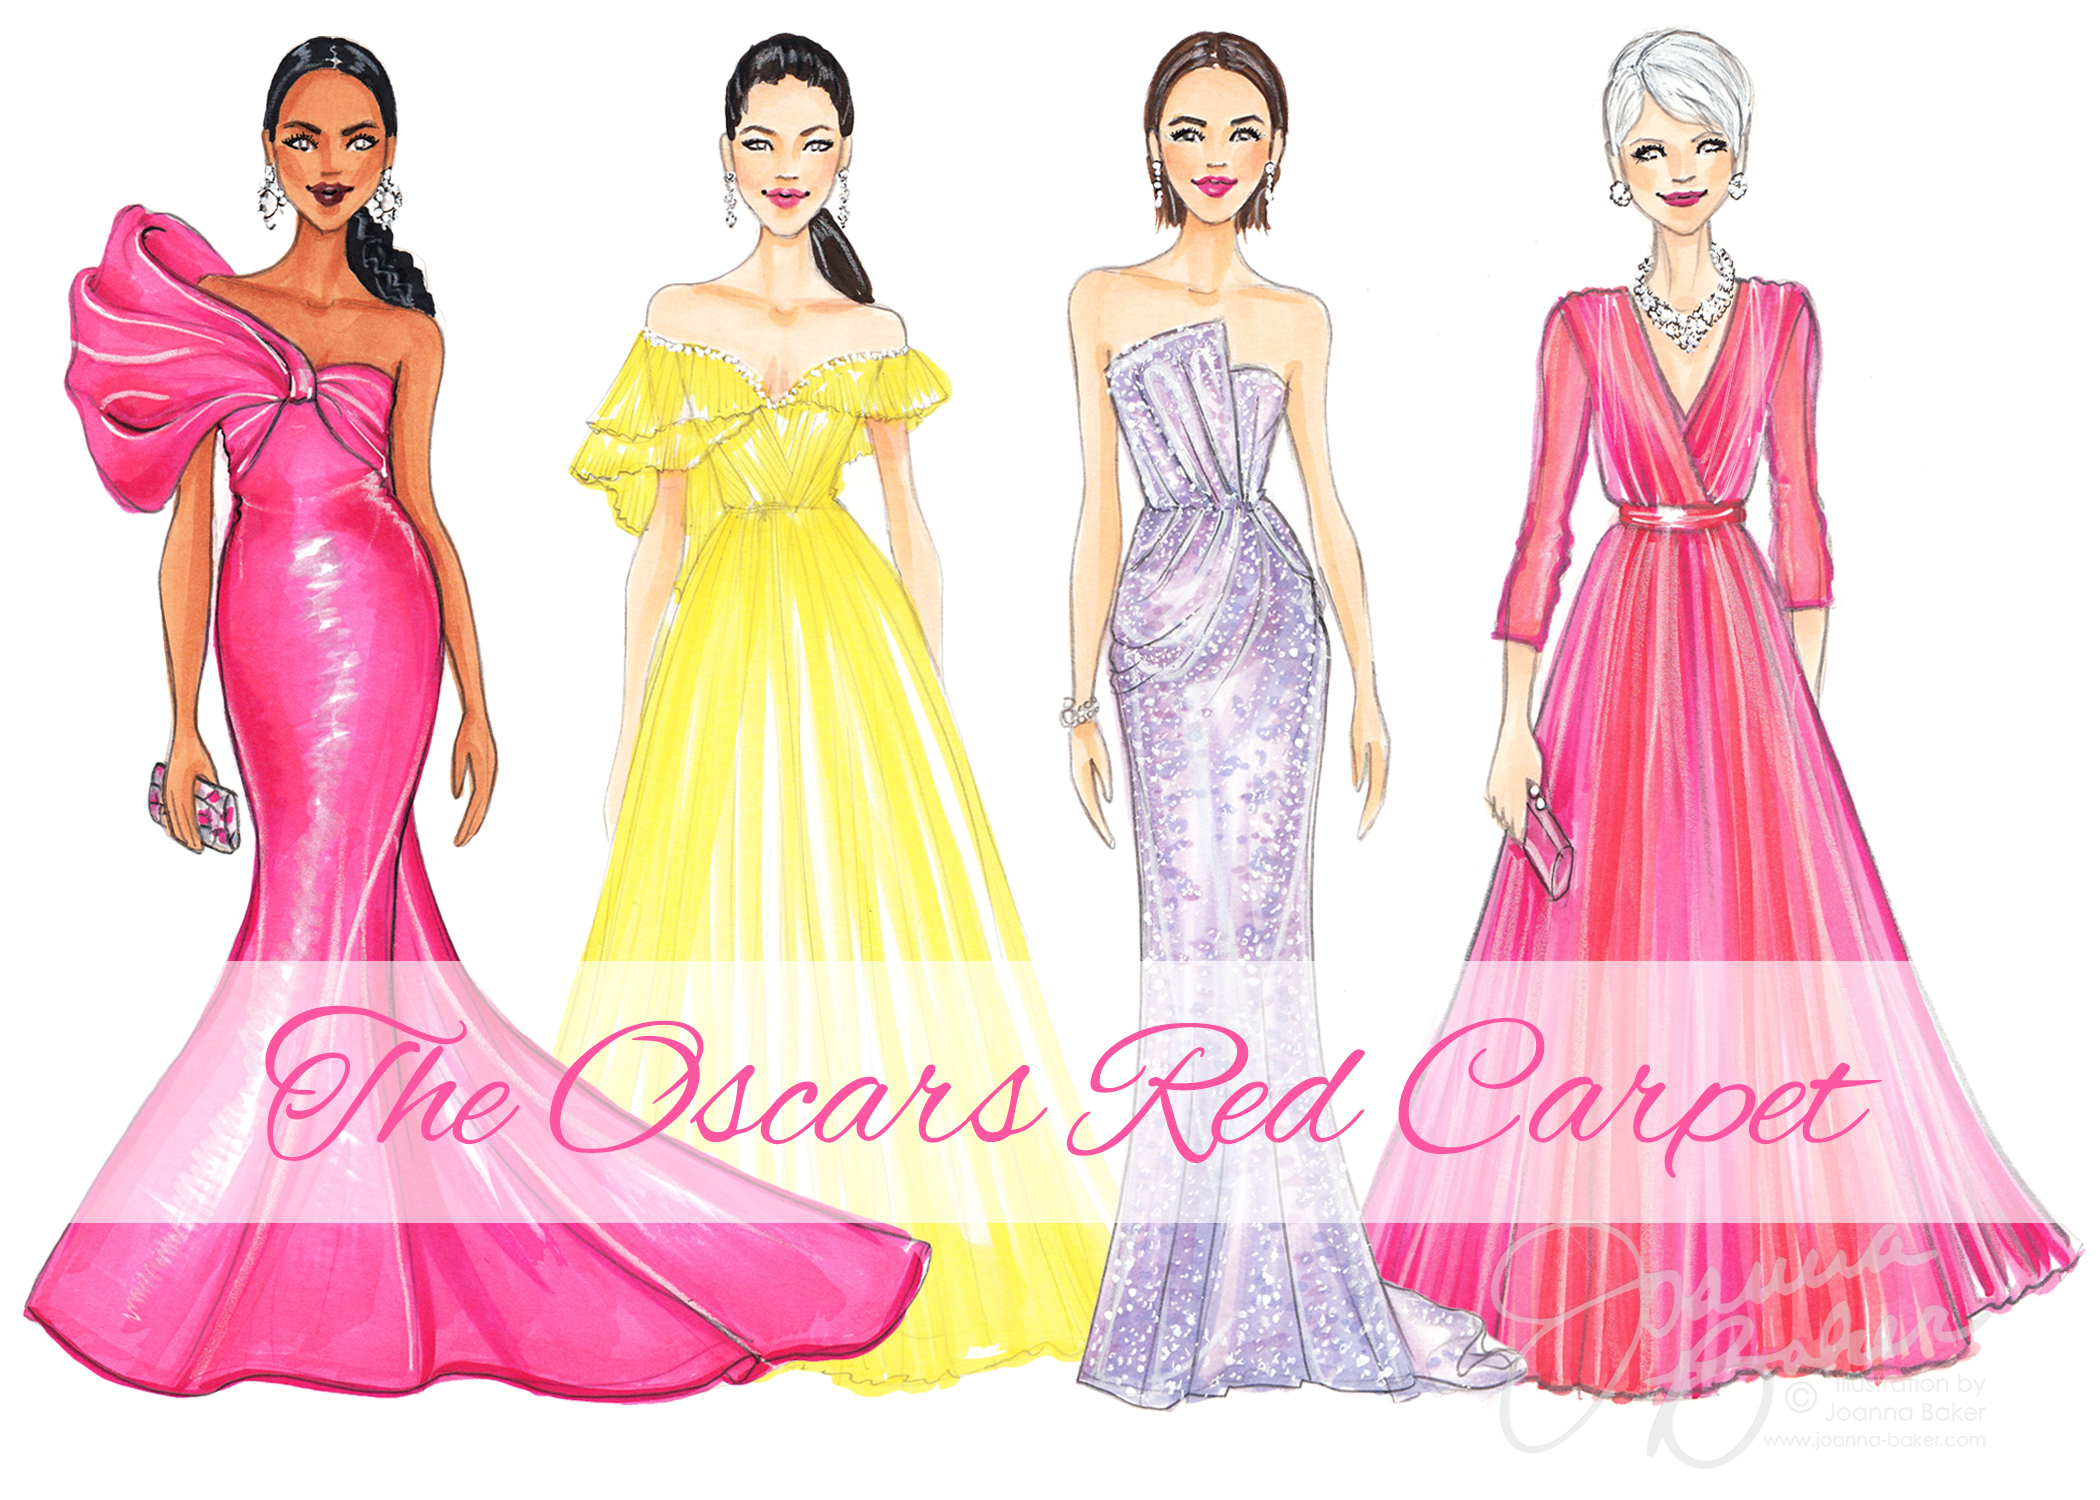 Oscars 2019 Red Carpet Fashion Illustrations by Joanna Baker